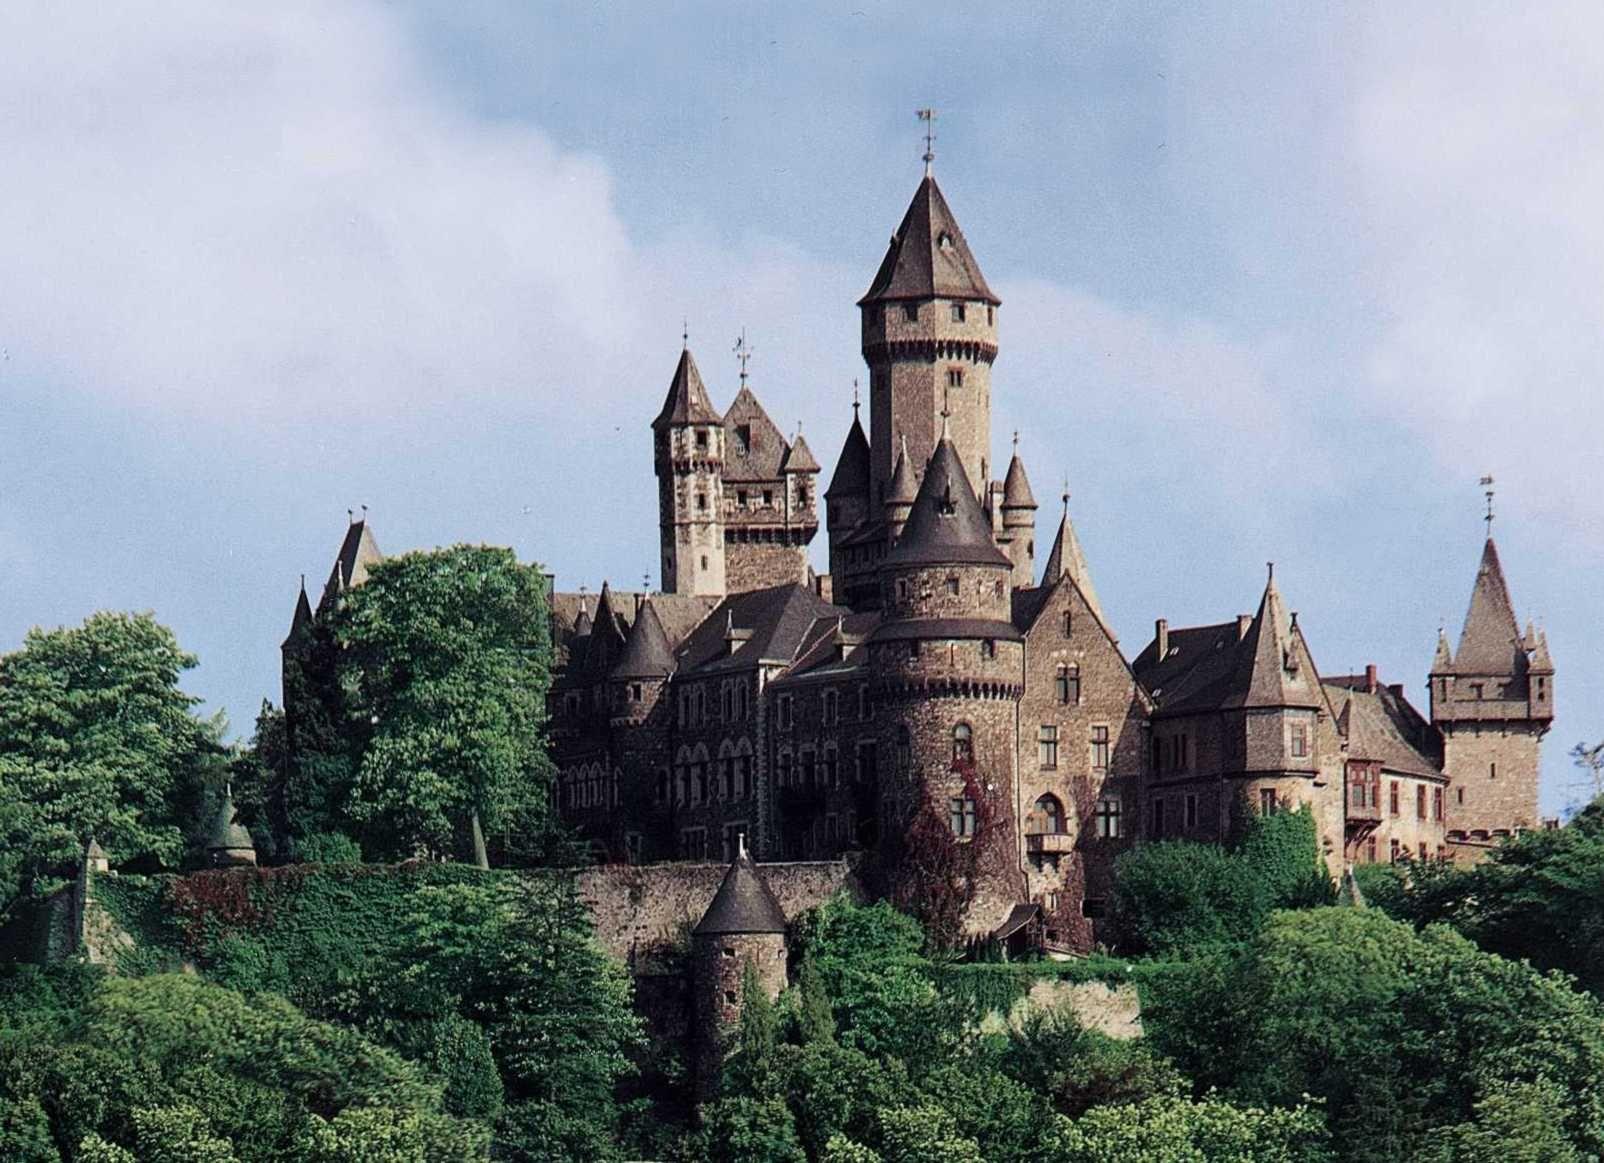 Braunfels Castle, Germany